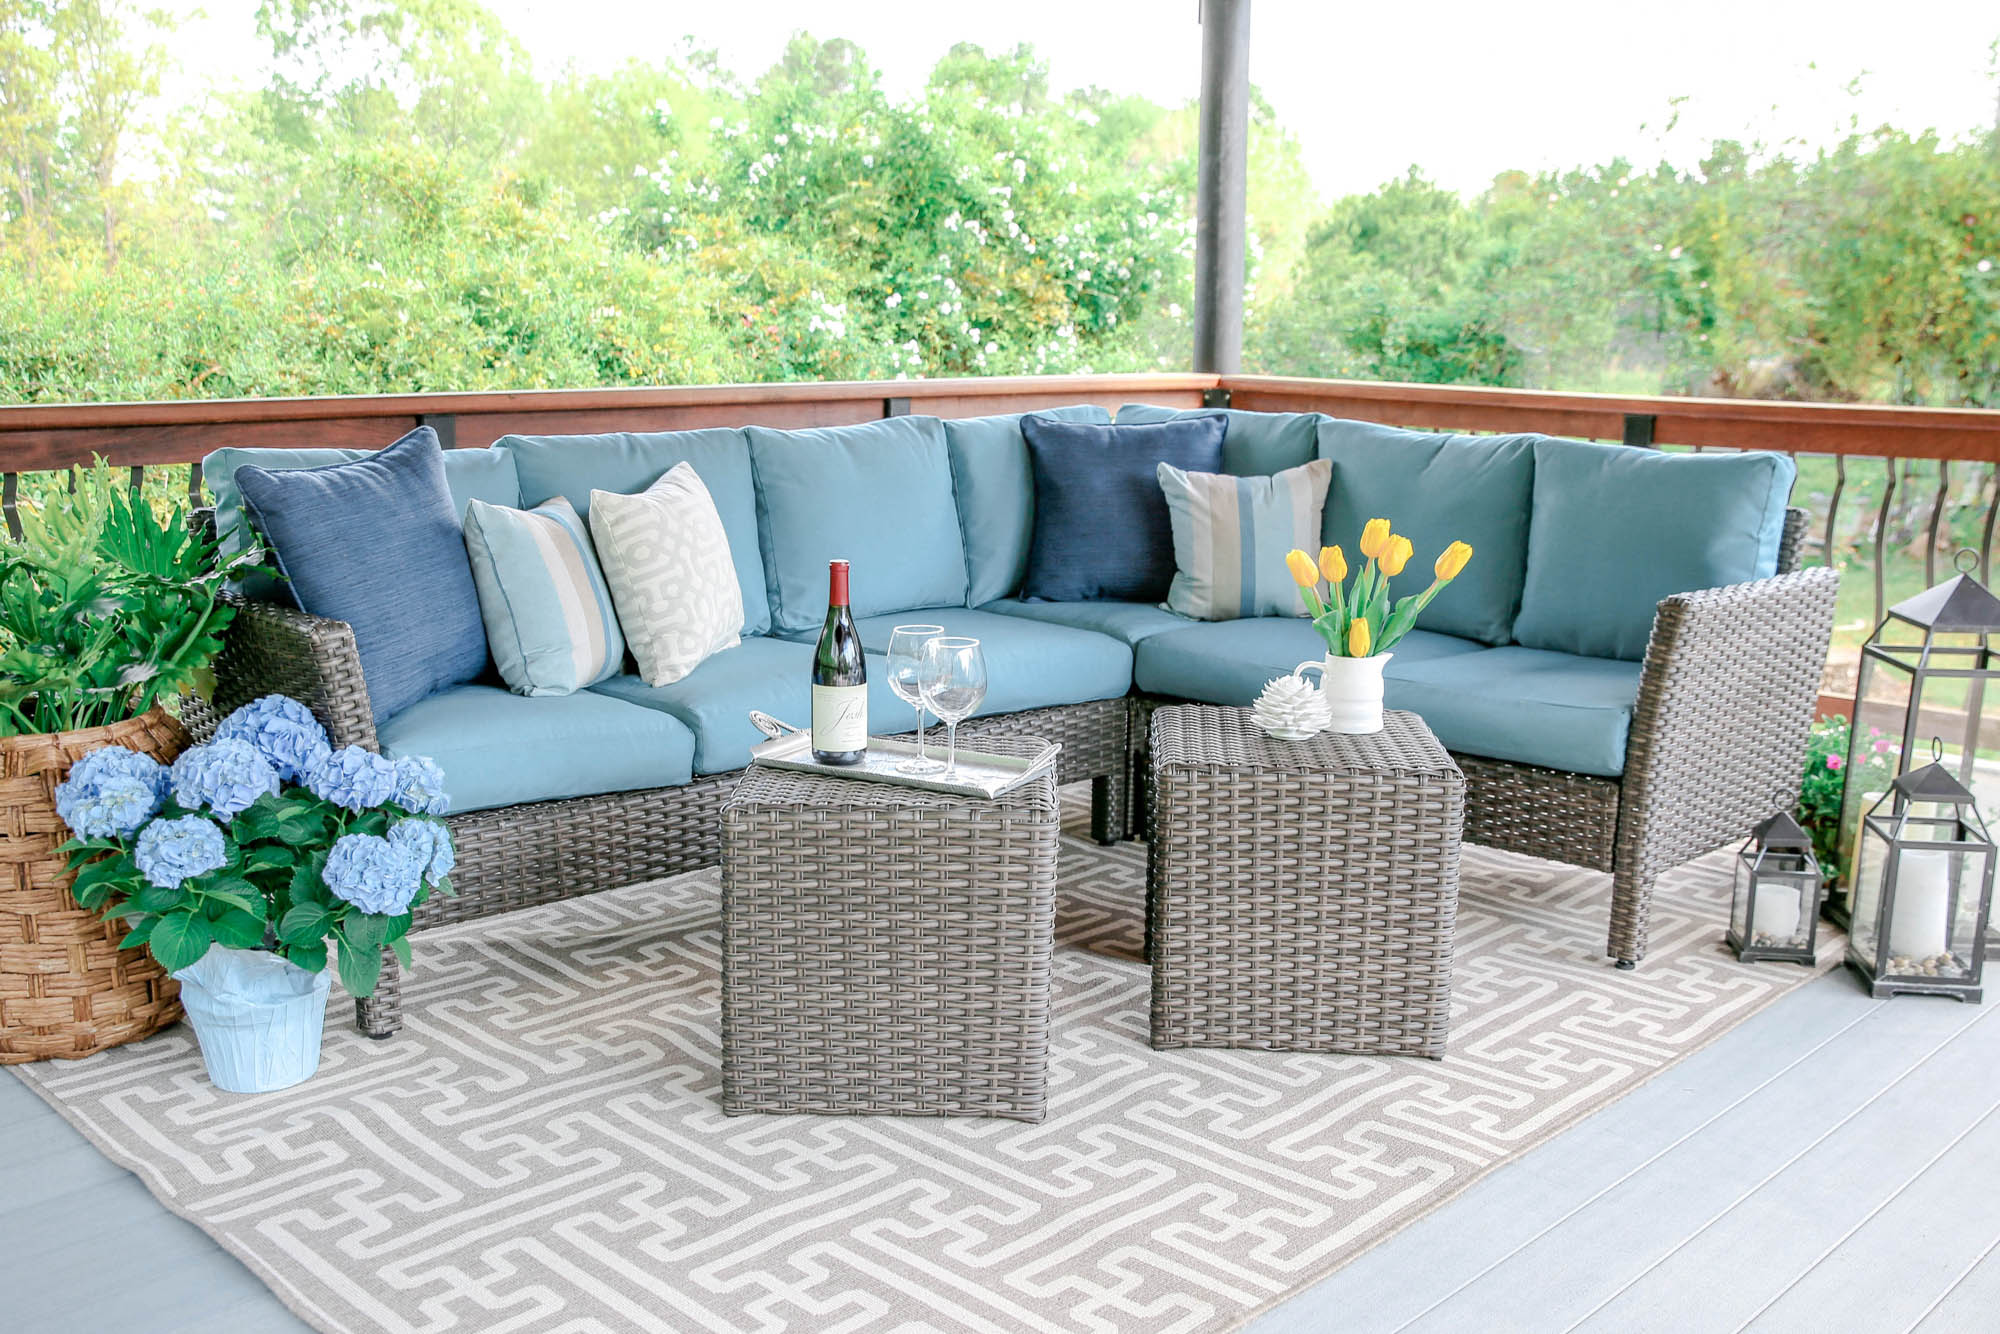 Canton-Blue-Leisure+Made-Patio+Furniture-1